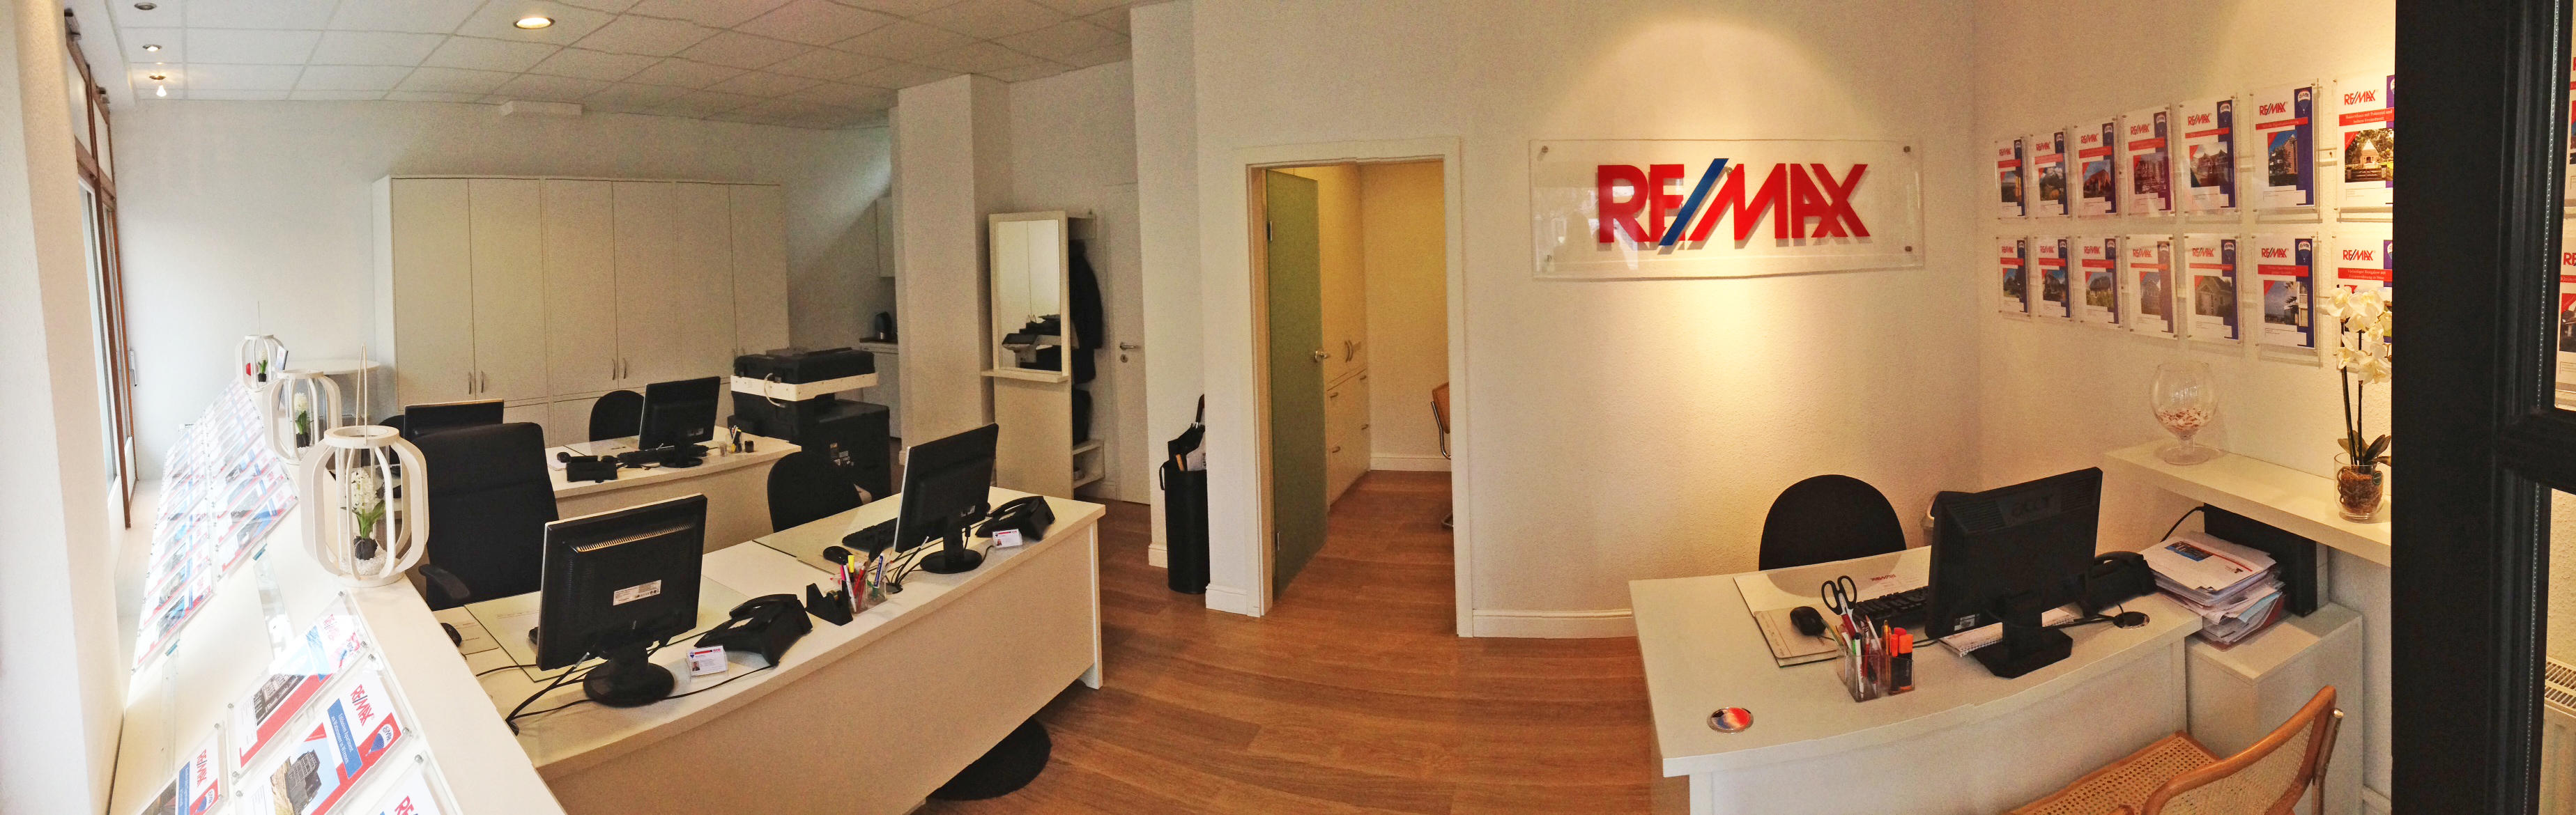 RE/MAX Immobilienmakler in Cuxhaven Cuxhaven